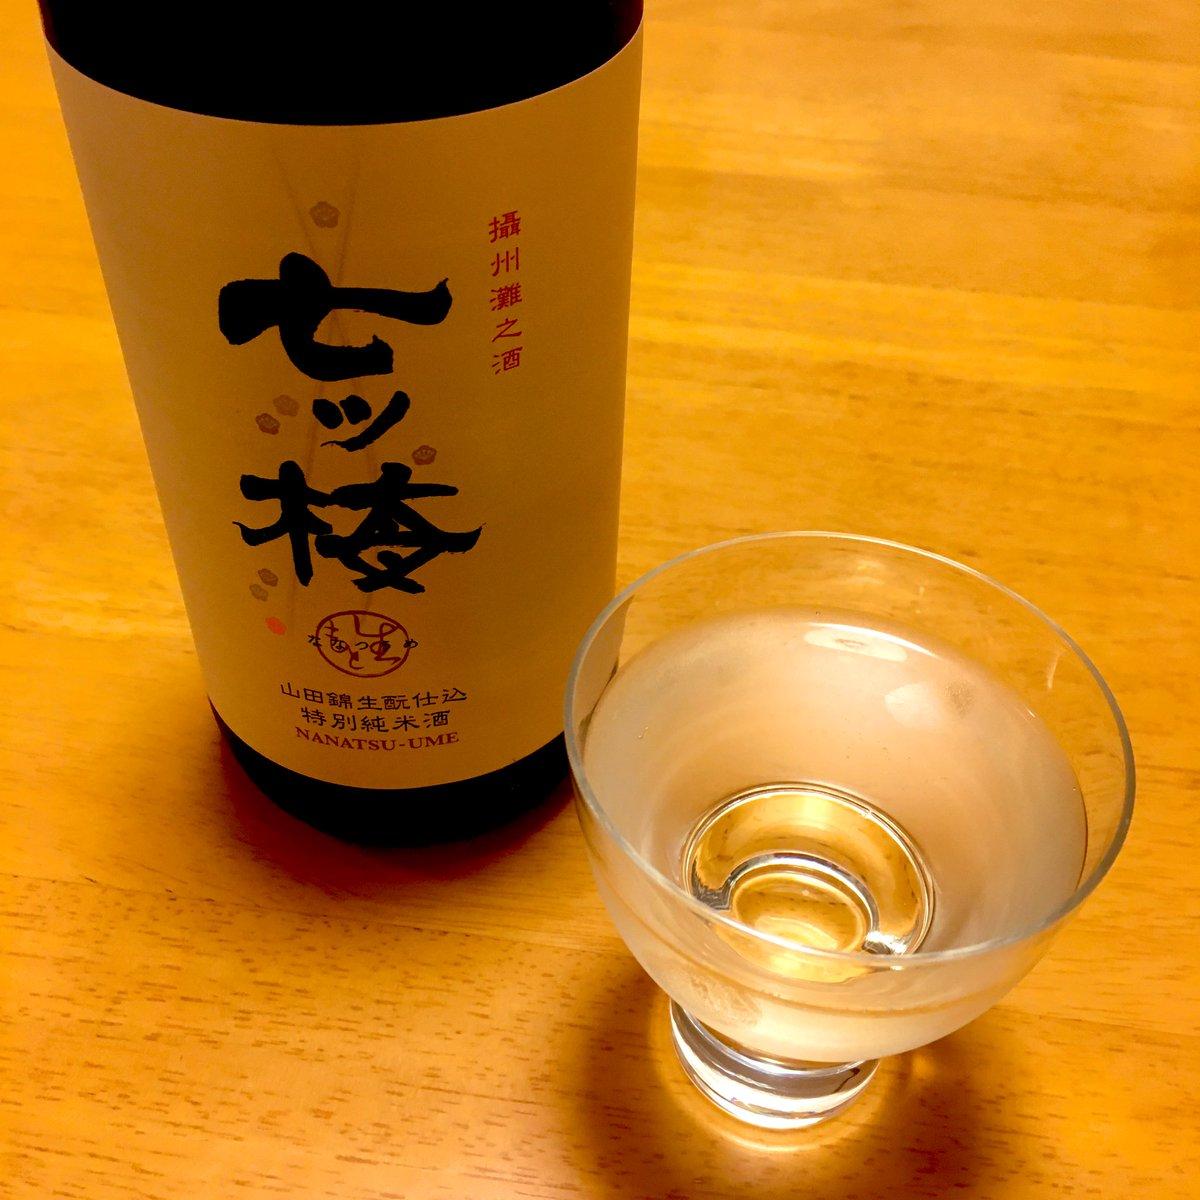 test ツイッターメディア - 兵庫県神戸市小山本家酒造「摂州灘之酒七ツ梅(ナナツウメ)」 ややぼけのある薄琥珀色。早春、朝靄に包まれれ薫る梅の花。花の蜜のようにとろける旨みを、フレッシュでシャープな酸味が包み込む。穏やかな辛さ。美味いぞ! #ツイッター晩酌部 #日本酒 https://t.co/v5xobXtATJ